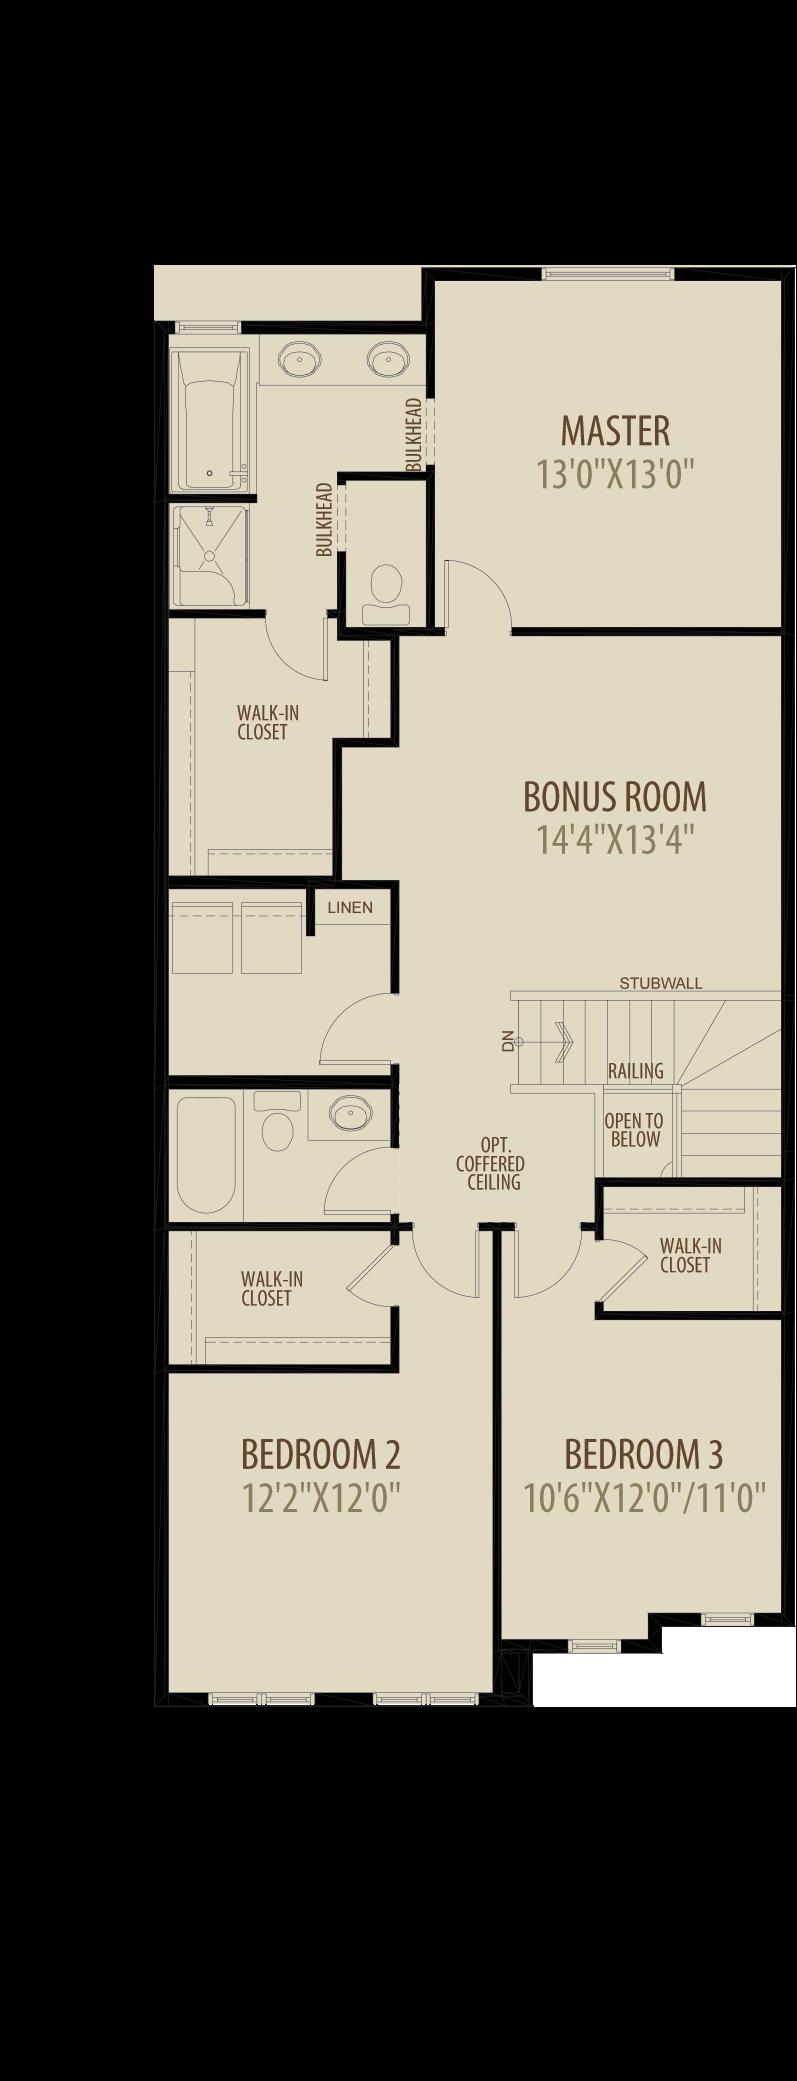 Option 9 Optional Upper Floor 2 adds 133 sq ft